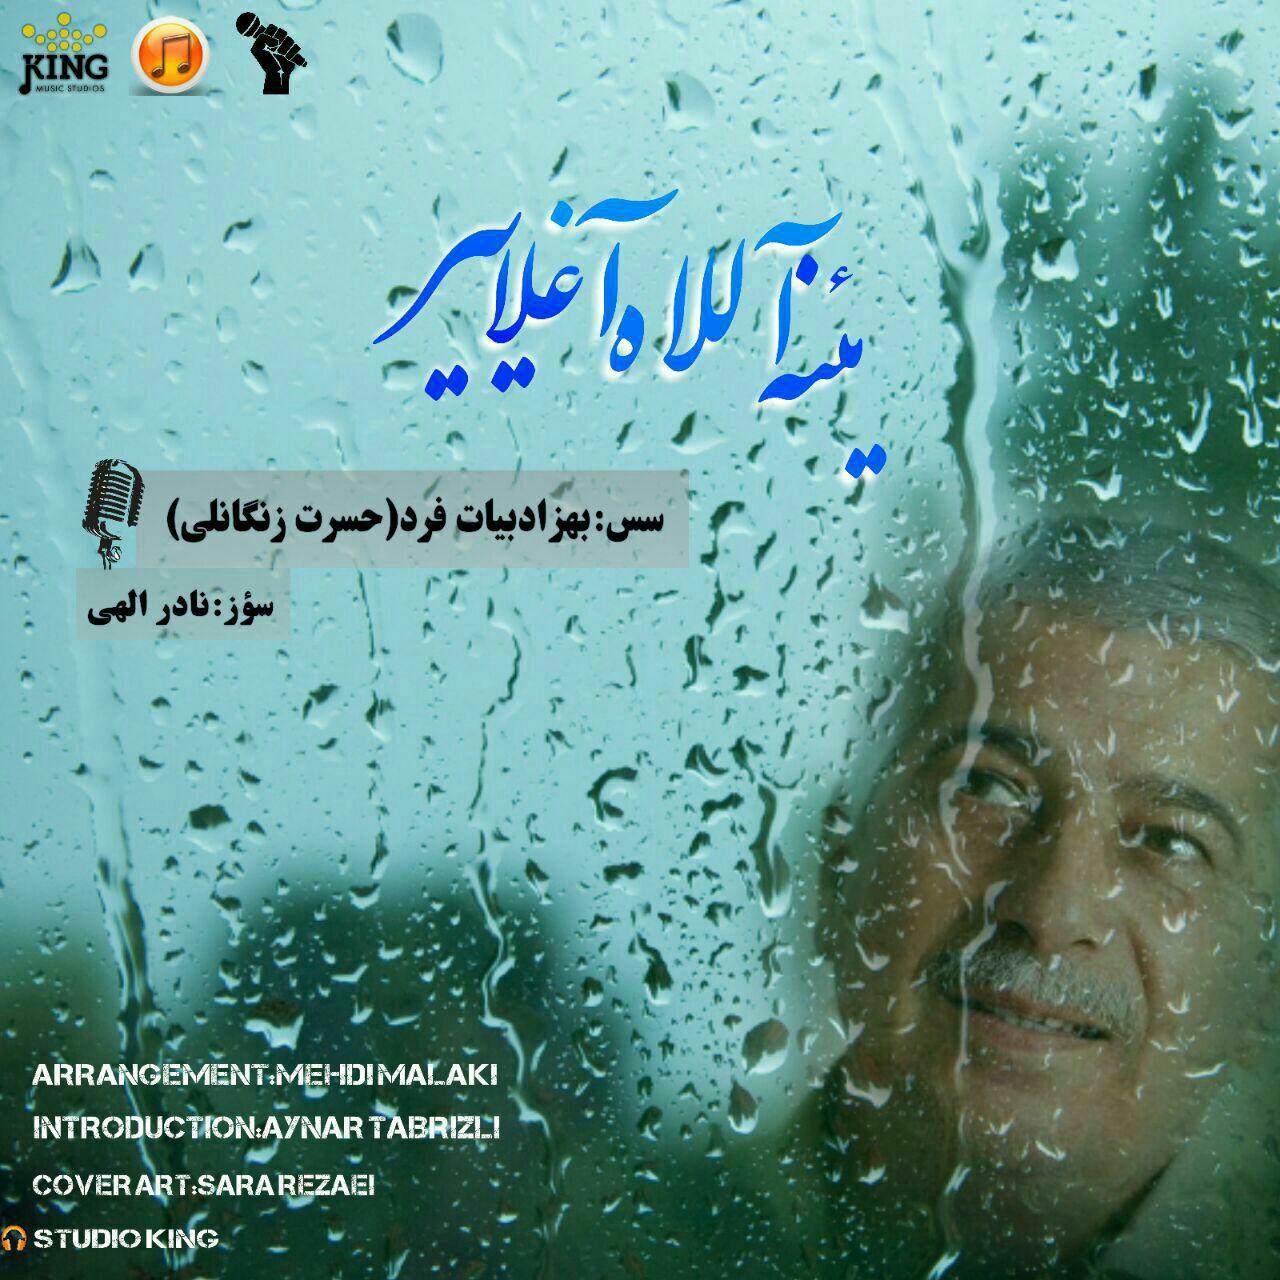 http://s8.picofile.com/file/8336024000/20Hasrat_Zanganli_Yine_Allah_Aghliyir.jpg